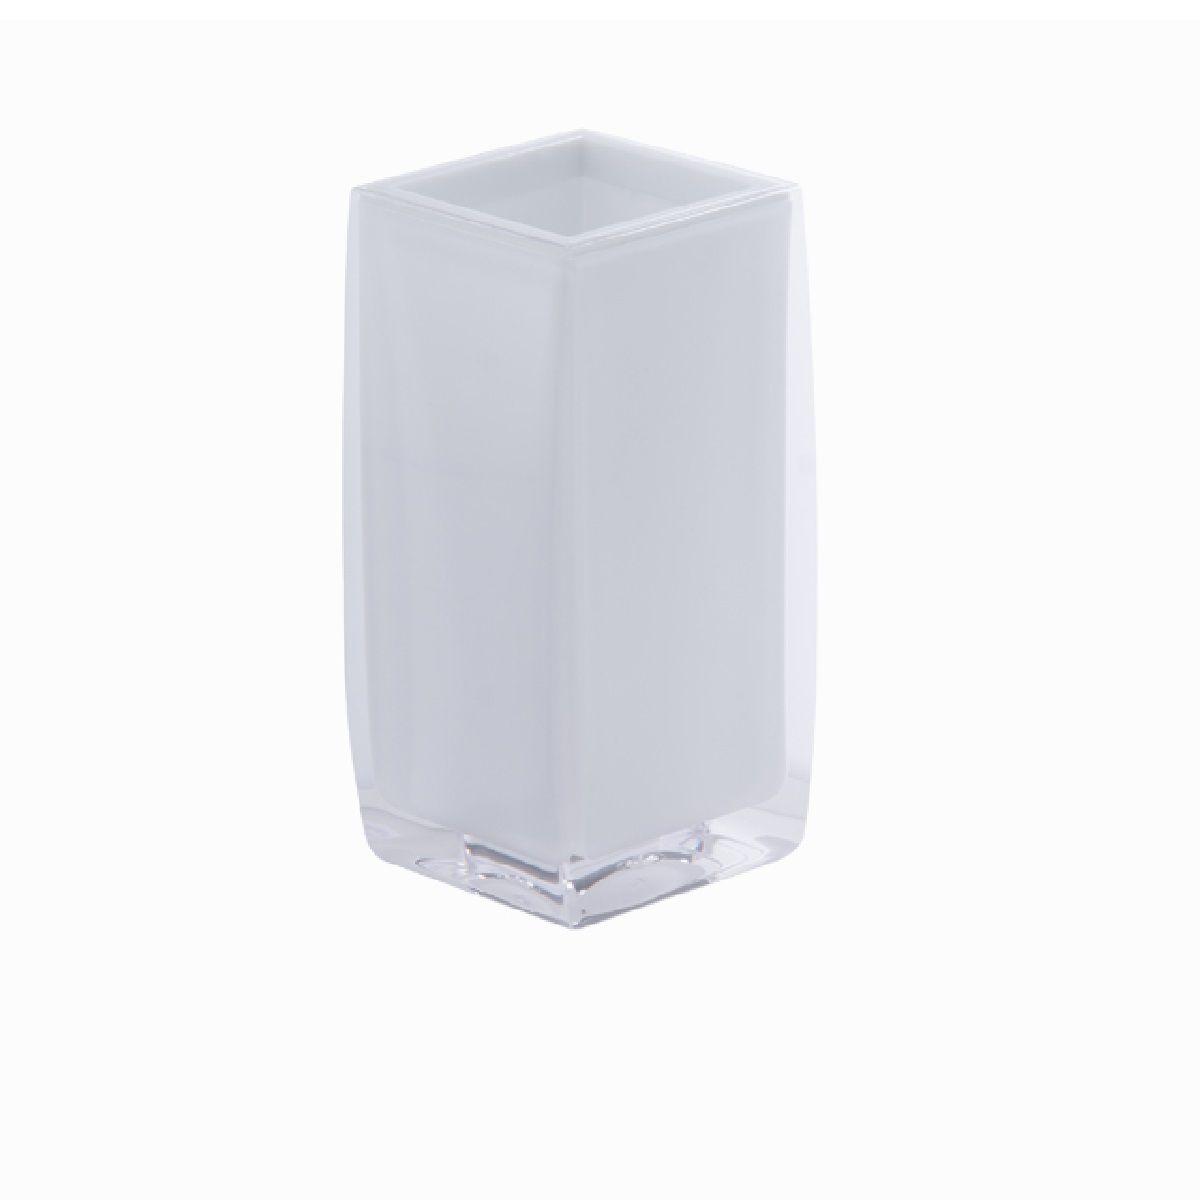 Porta Objetos Dupla Camada KBB3/PO – Branco